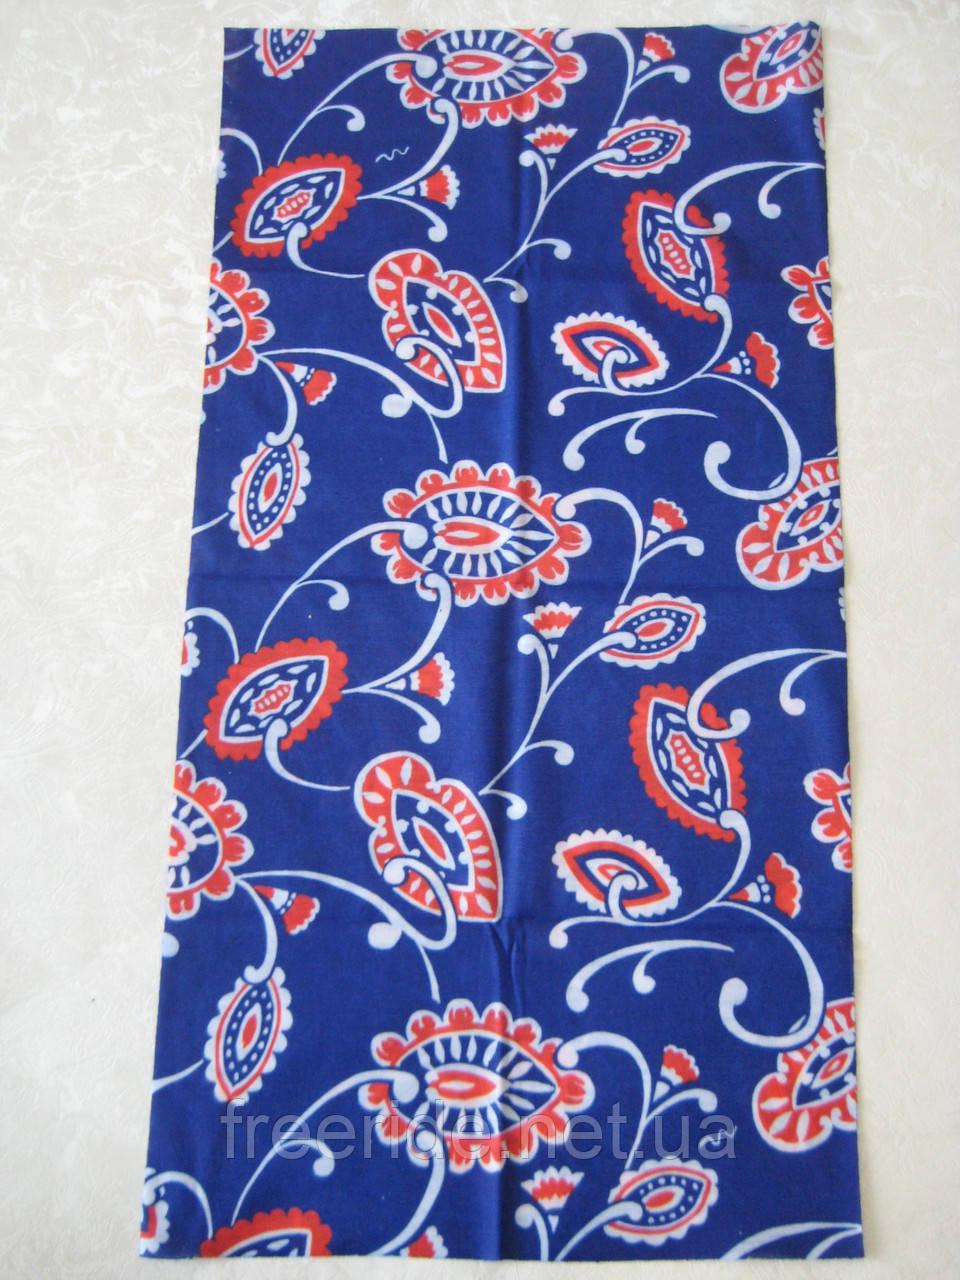 Летний бафф, buff, бесшовный шарф, повязка (#312)